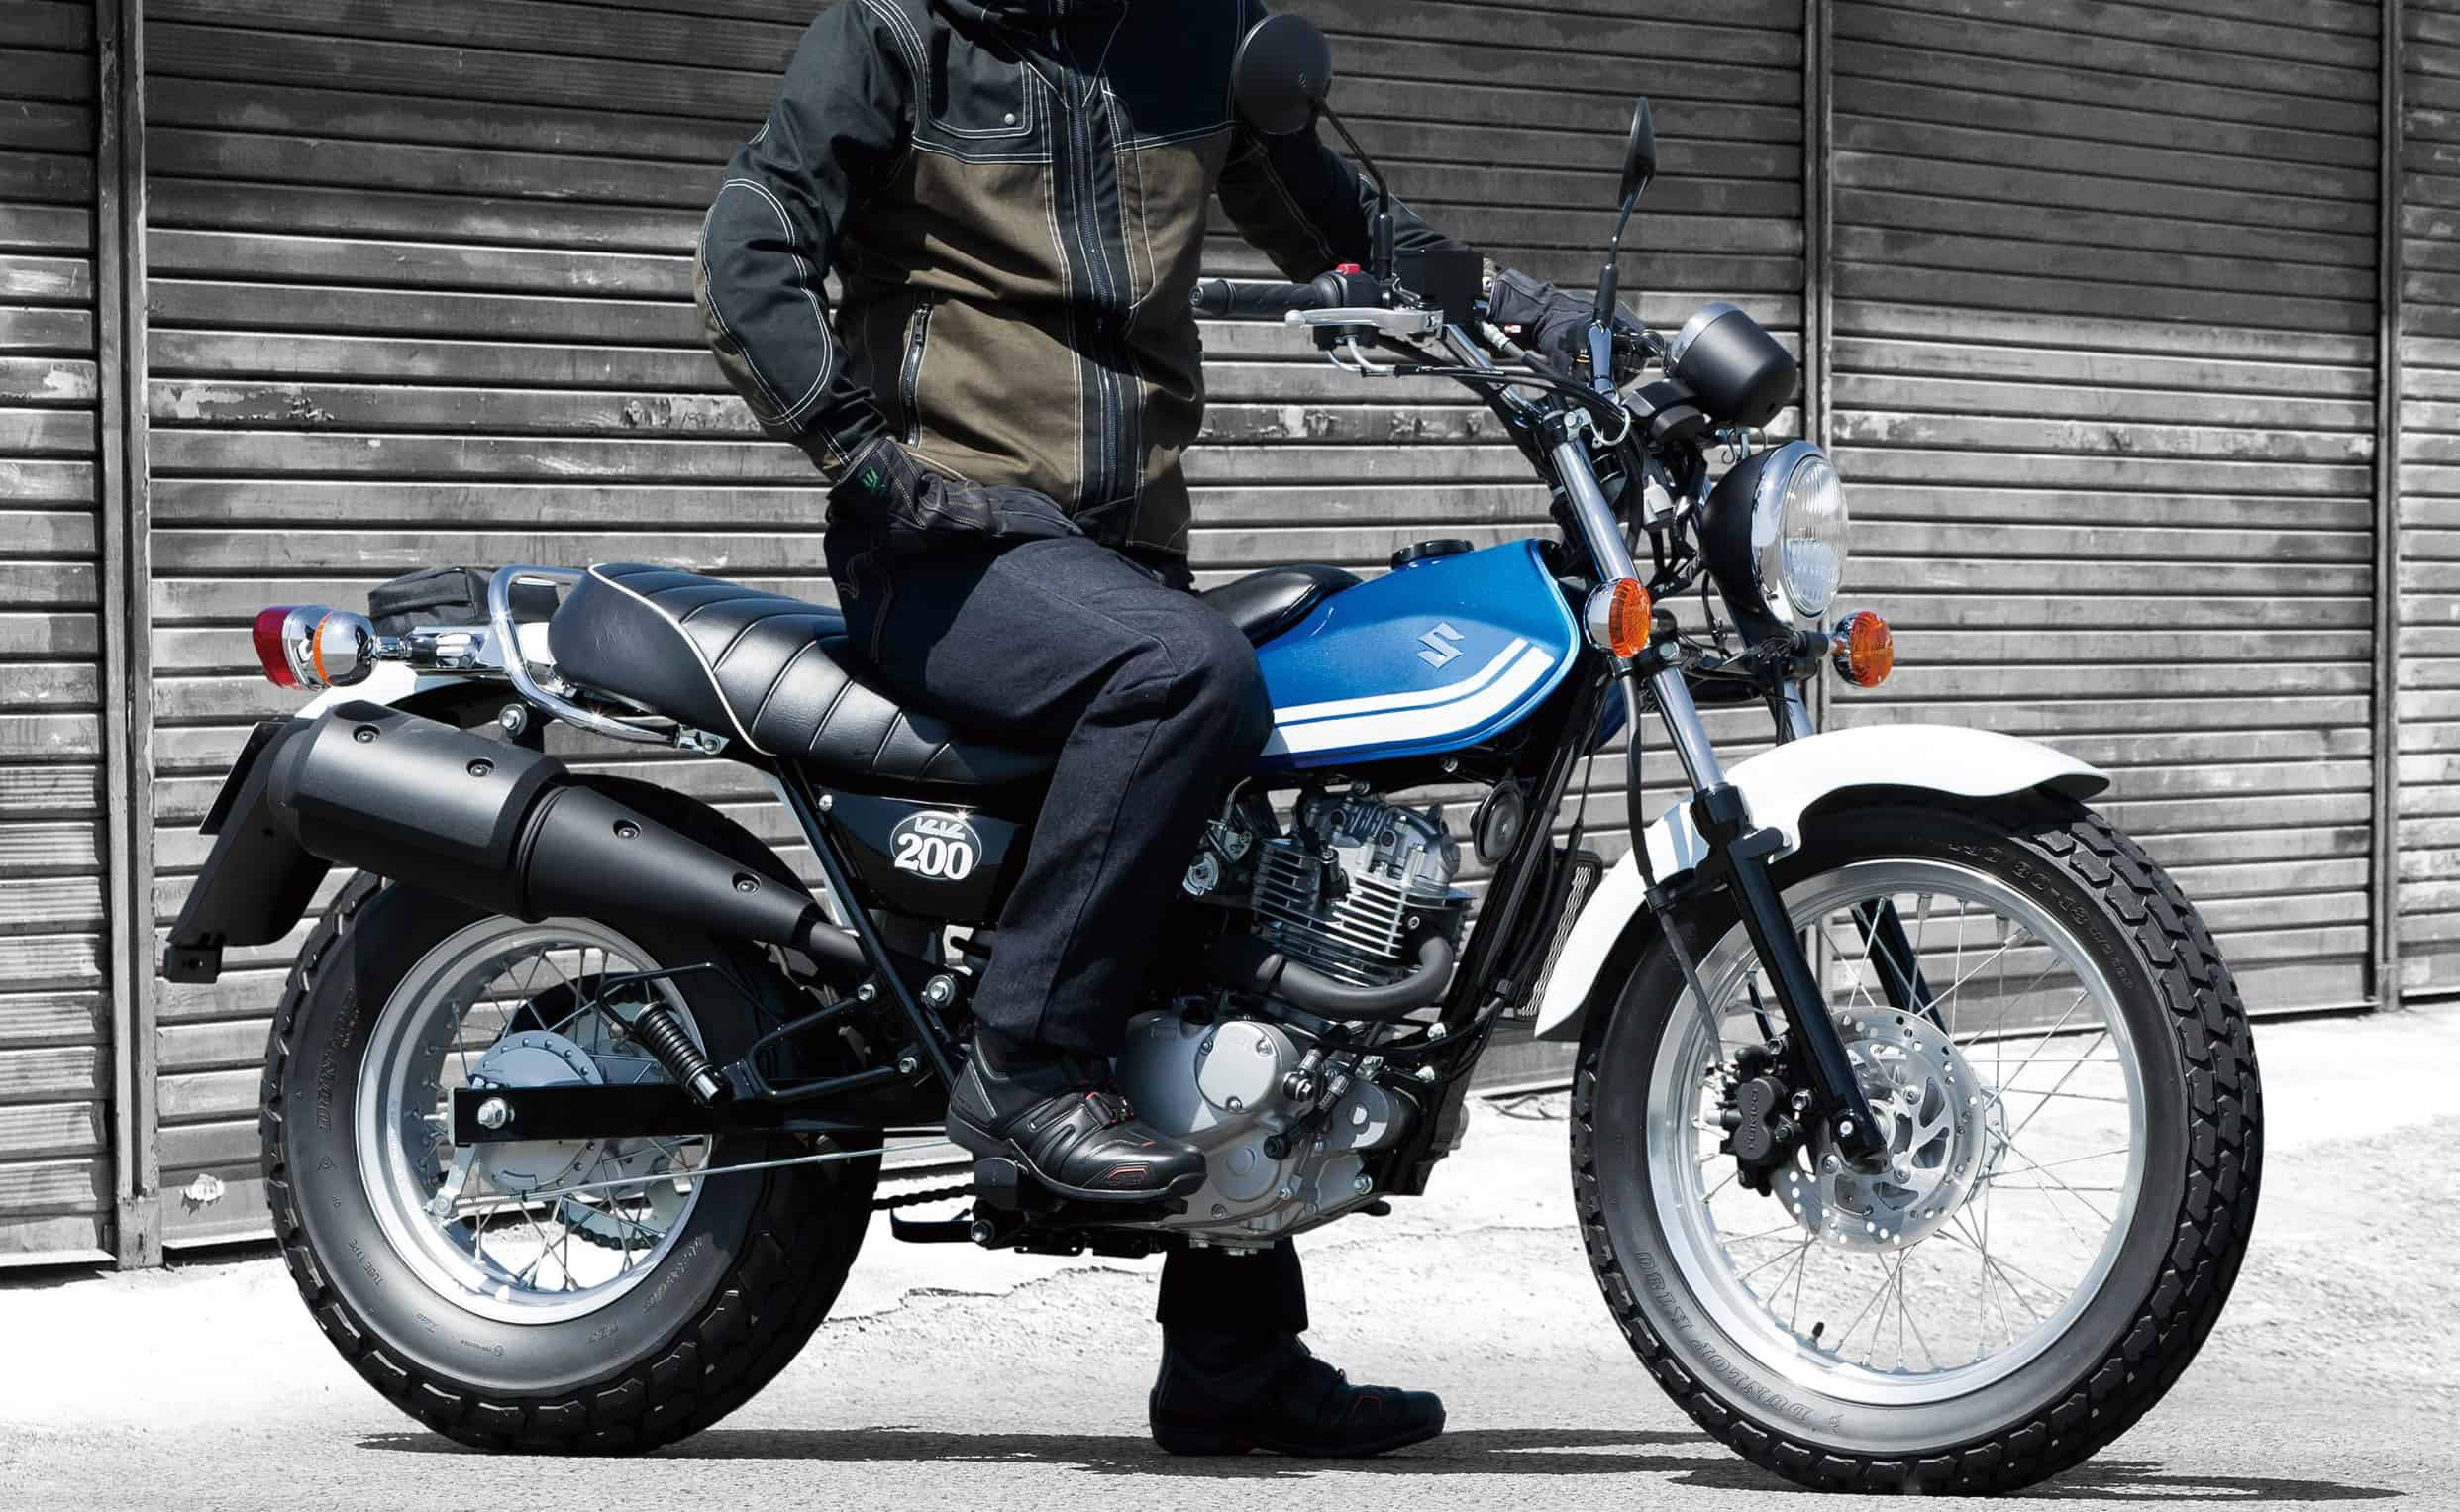 Suzuki Vanvan 200 – commuter motorcycle